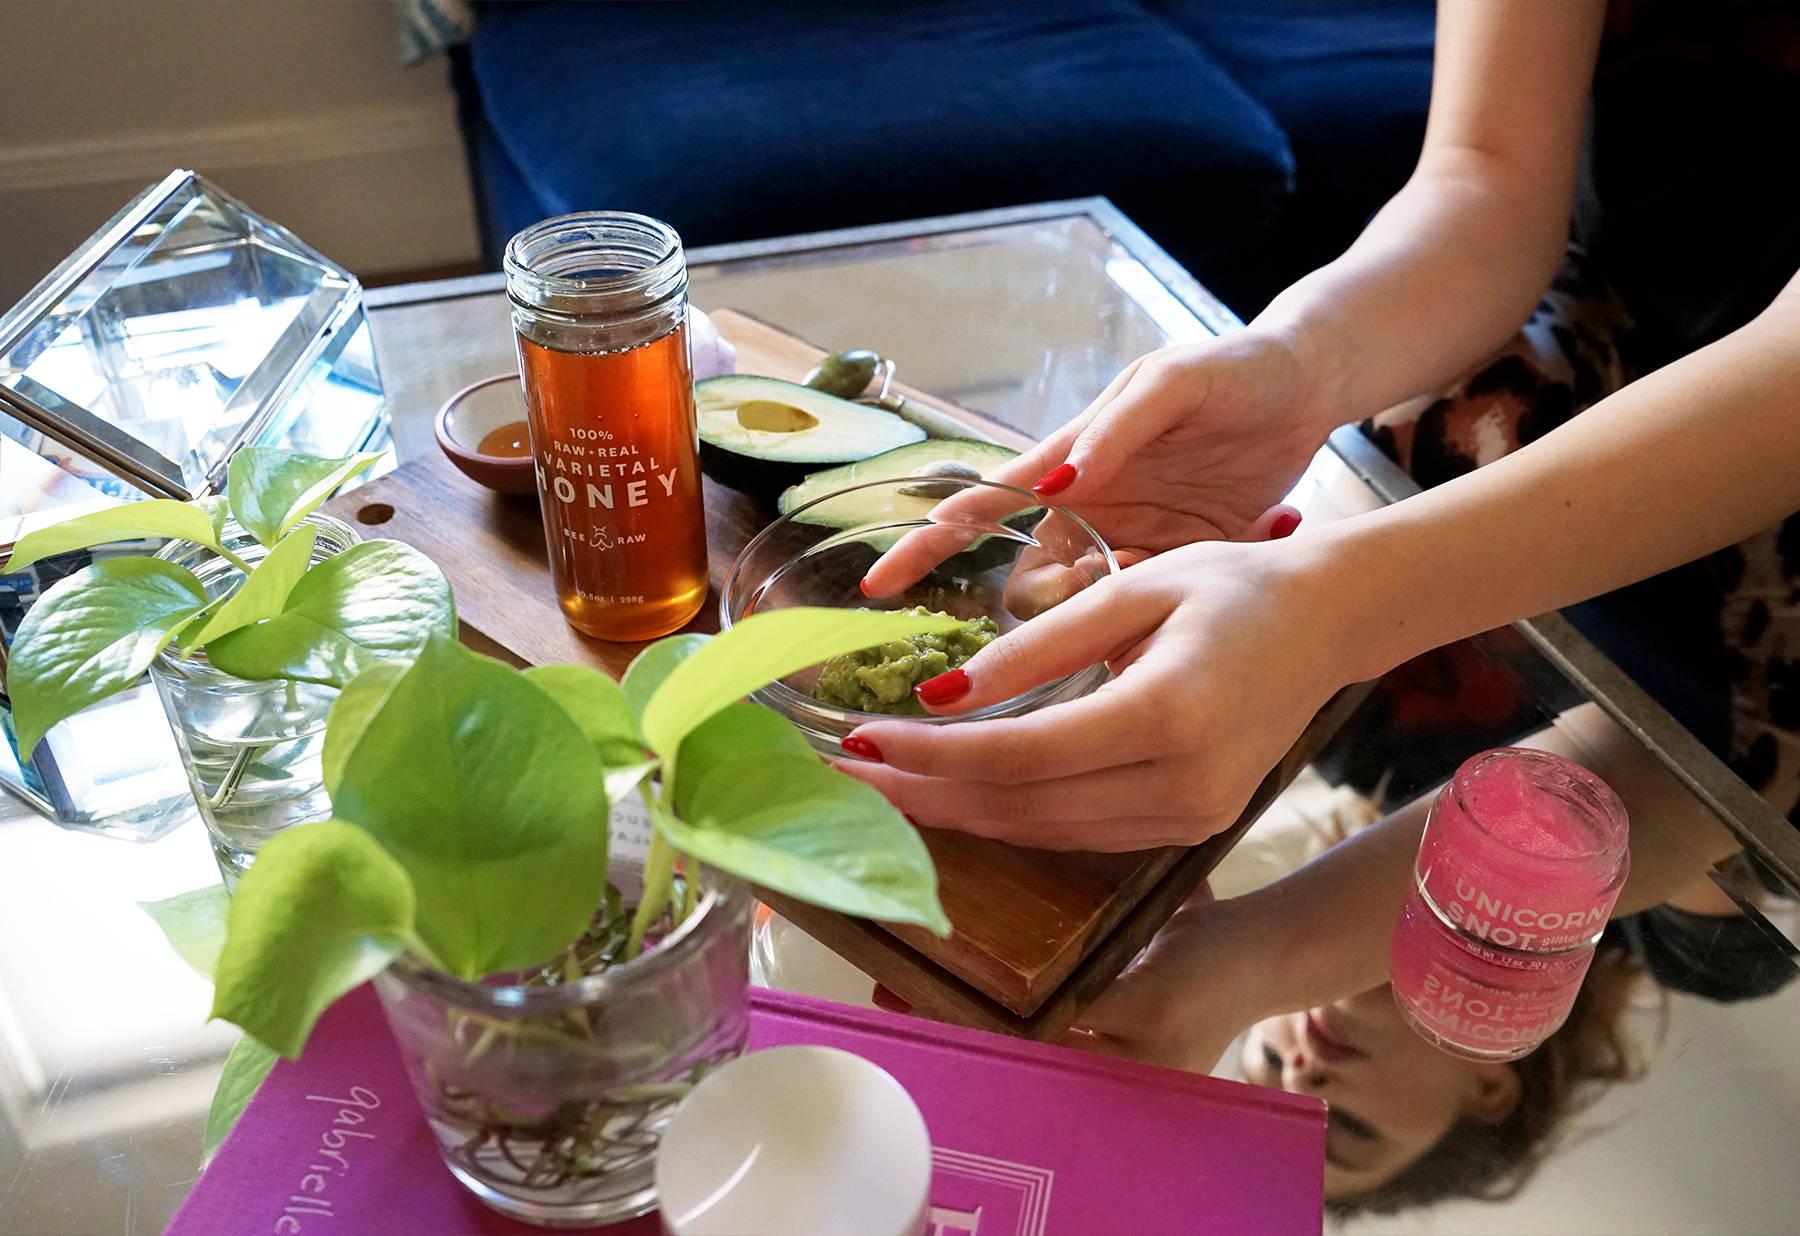 Make an avocado and honey mask before putting on Unicorn Snot glitter gel.